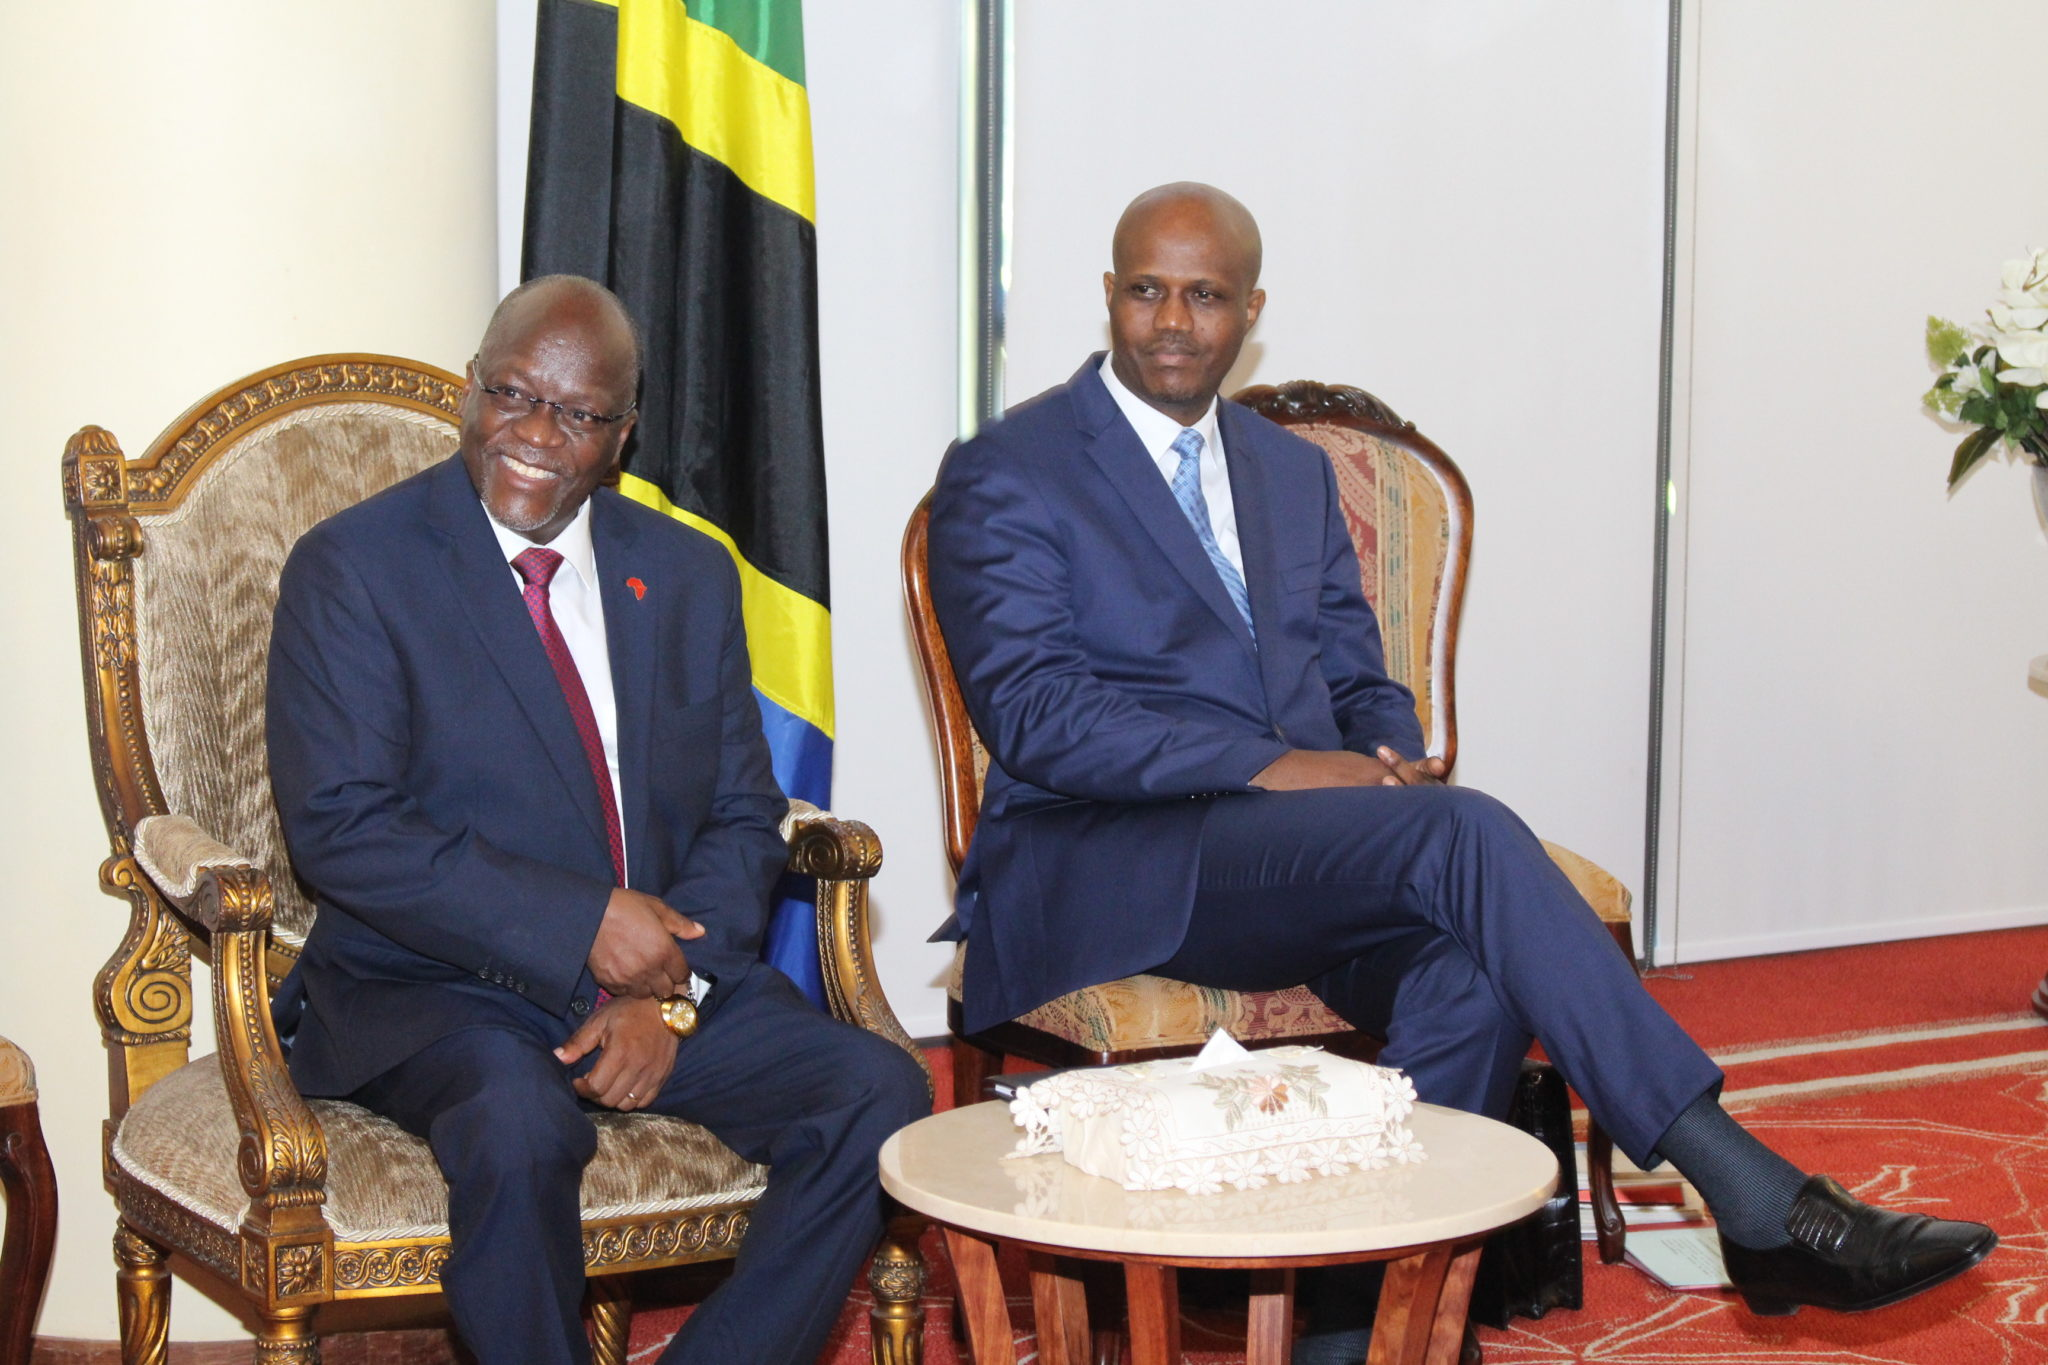 H.E Dr John Pombe Magufuli, President of the United Republic of Tanzania and Chair of the EAC Summit alongside the EAC Secretary General Amb Liberat Mfumukeko